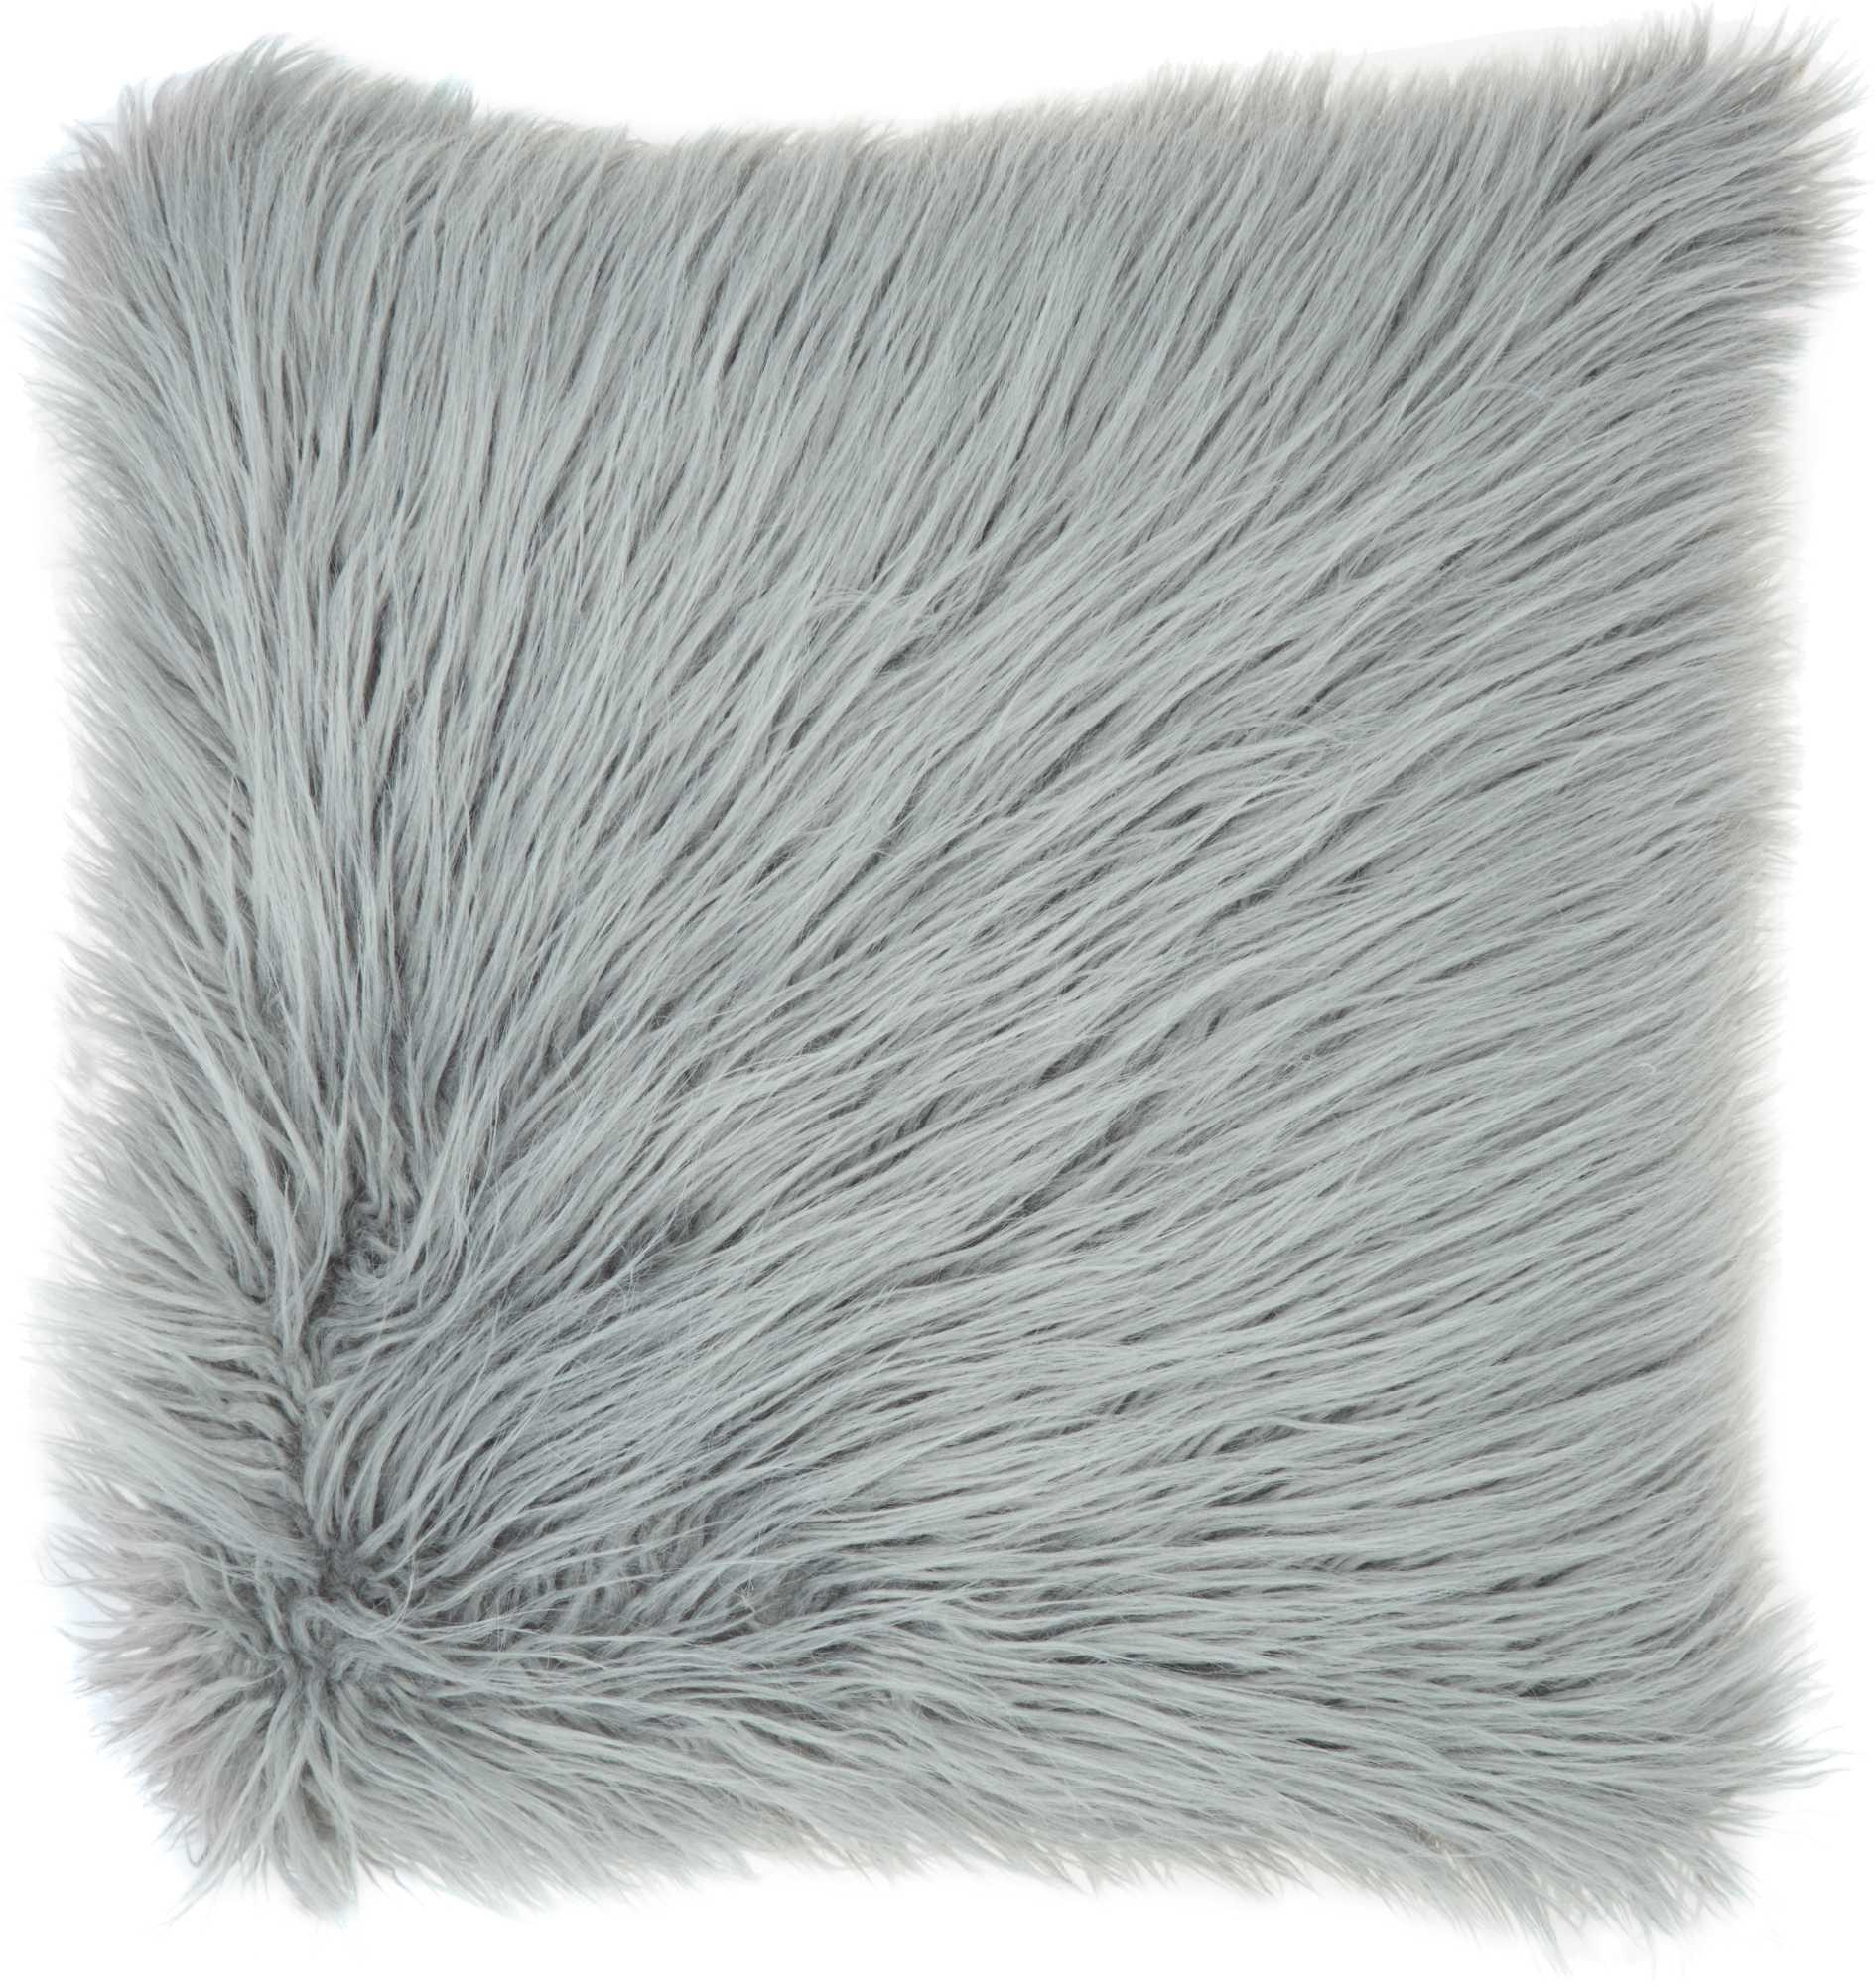 faux fur bj101 light grey 17